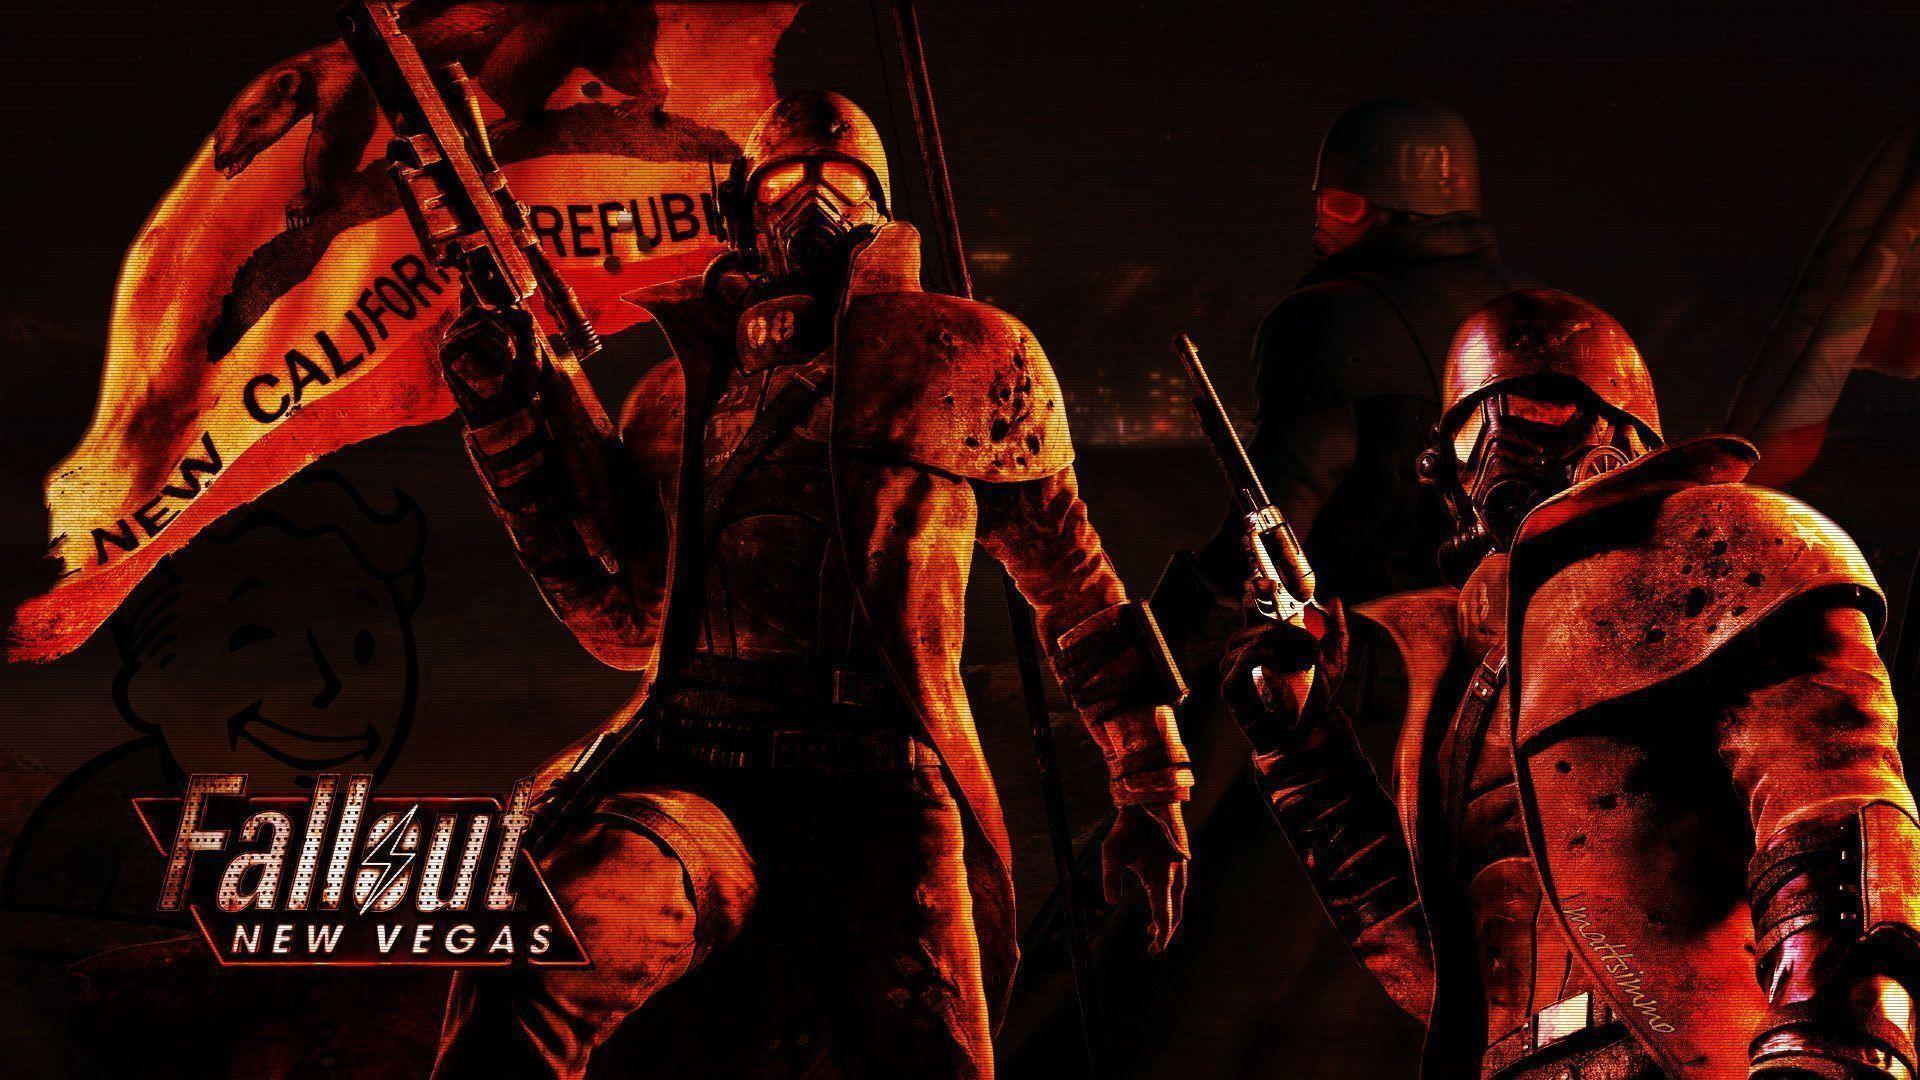 1920x1080 Fallout New Vegas Wallpaper 1080p Design Ideas ~ Fallout New Vegas .